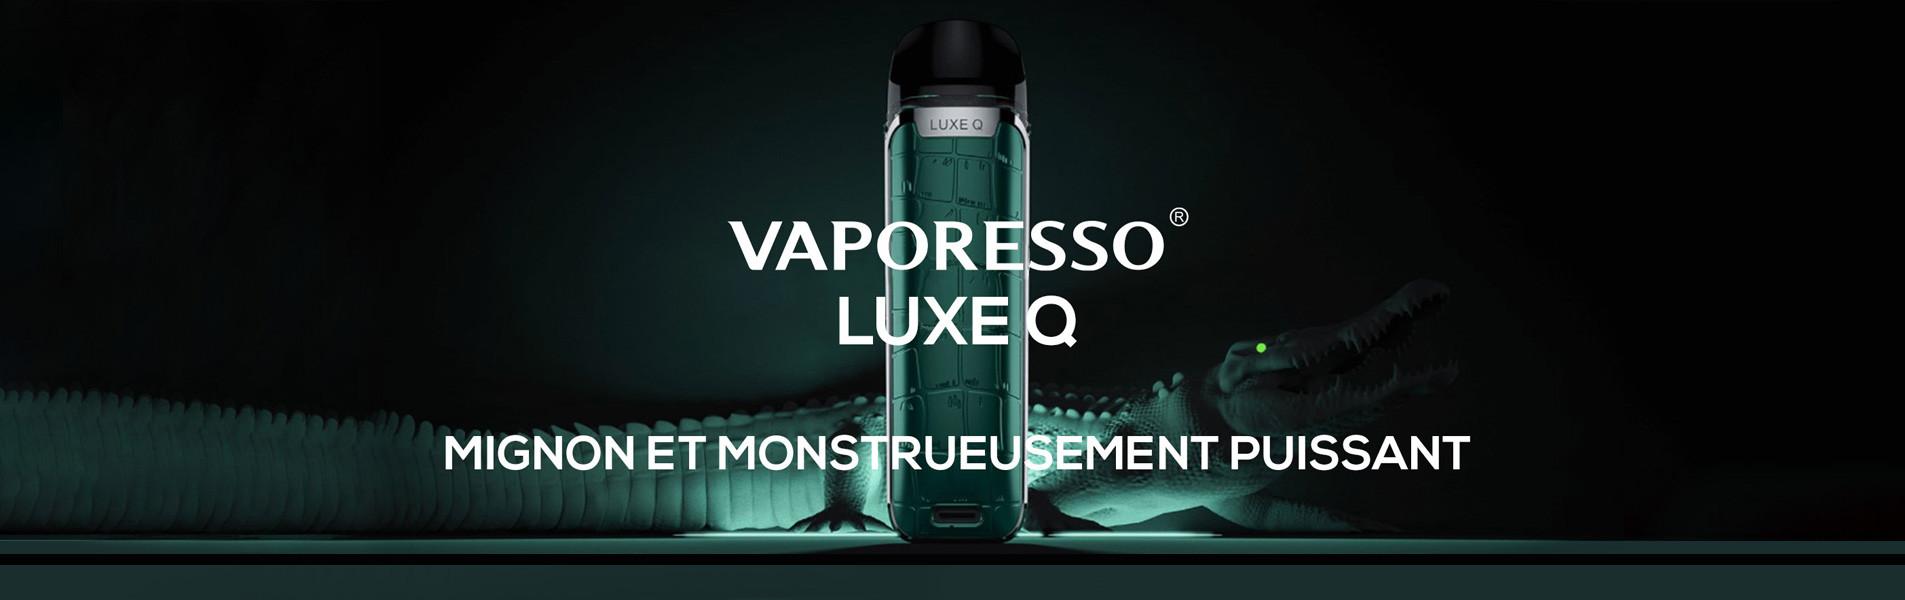 Kit Luxe Q : un pod miniature